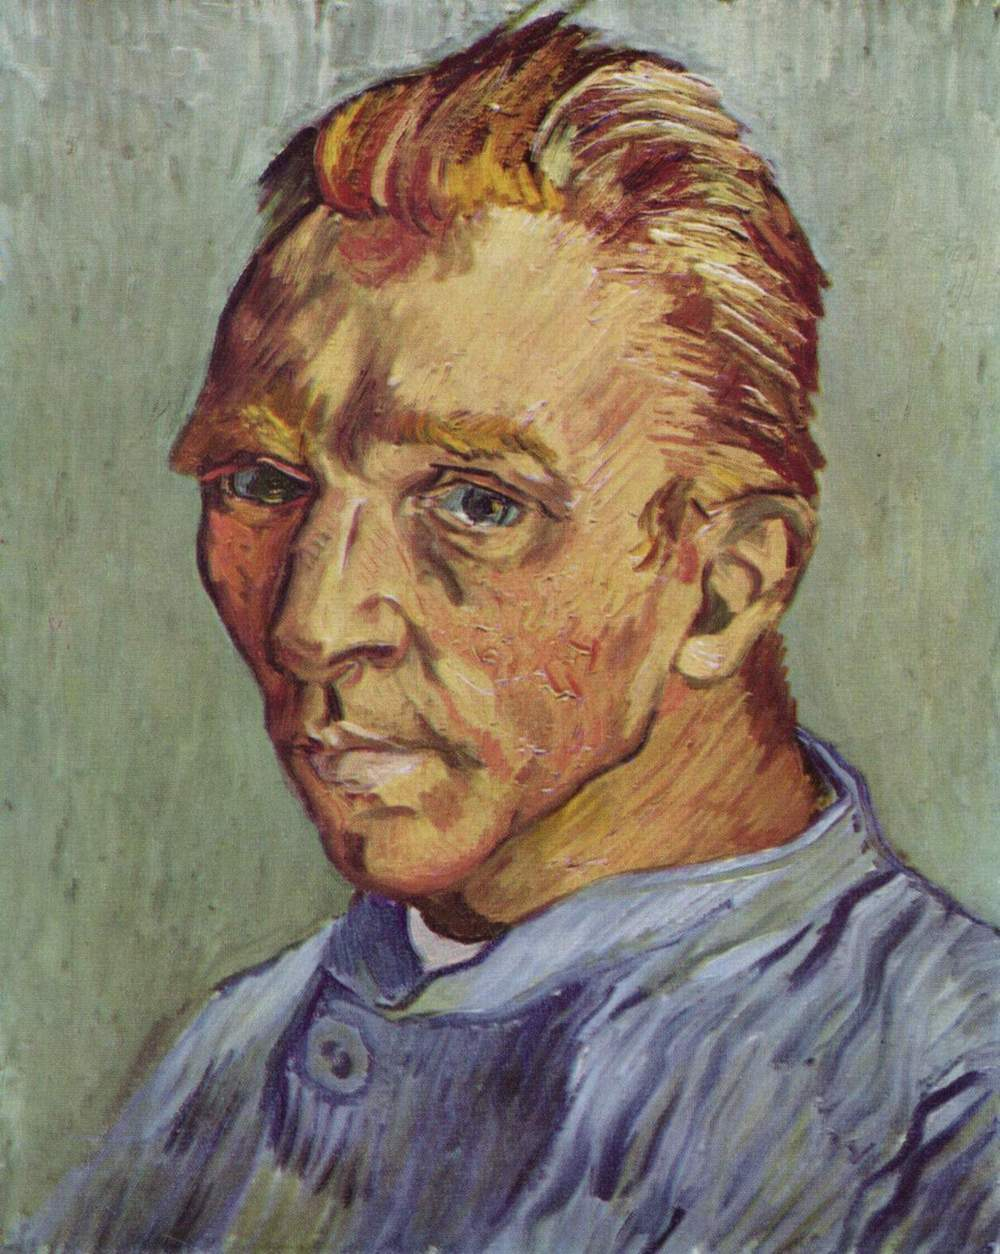 Self-Portrait Without Beard